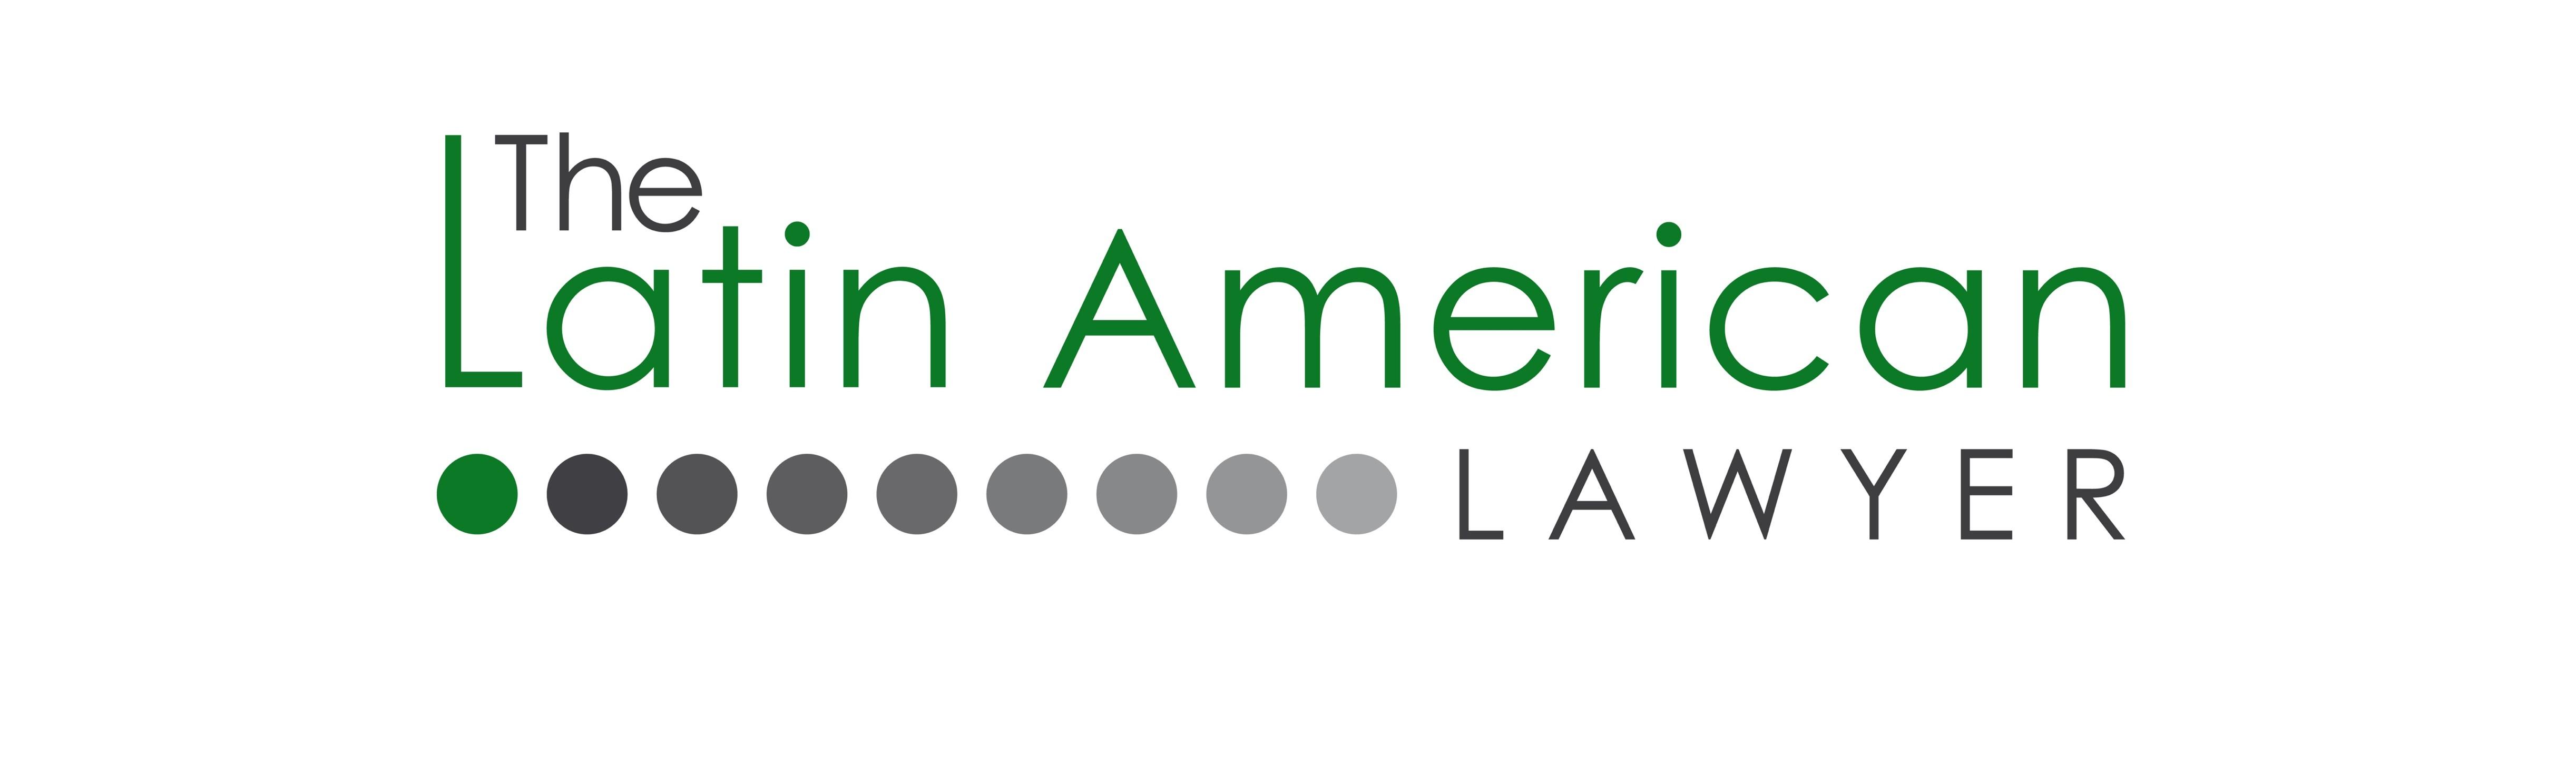 THE LATIN AMERICAN LAWYER   LinkedIn